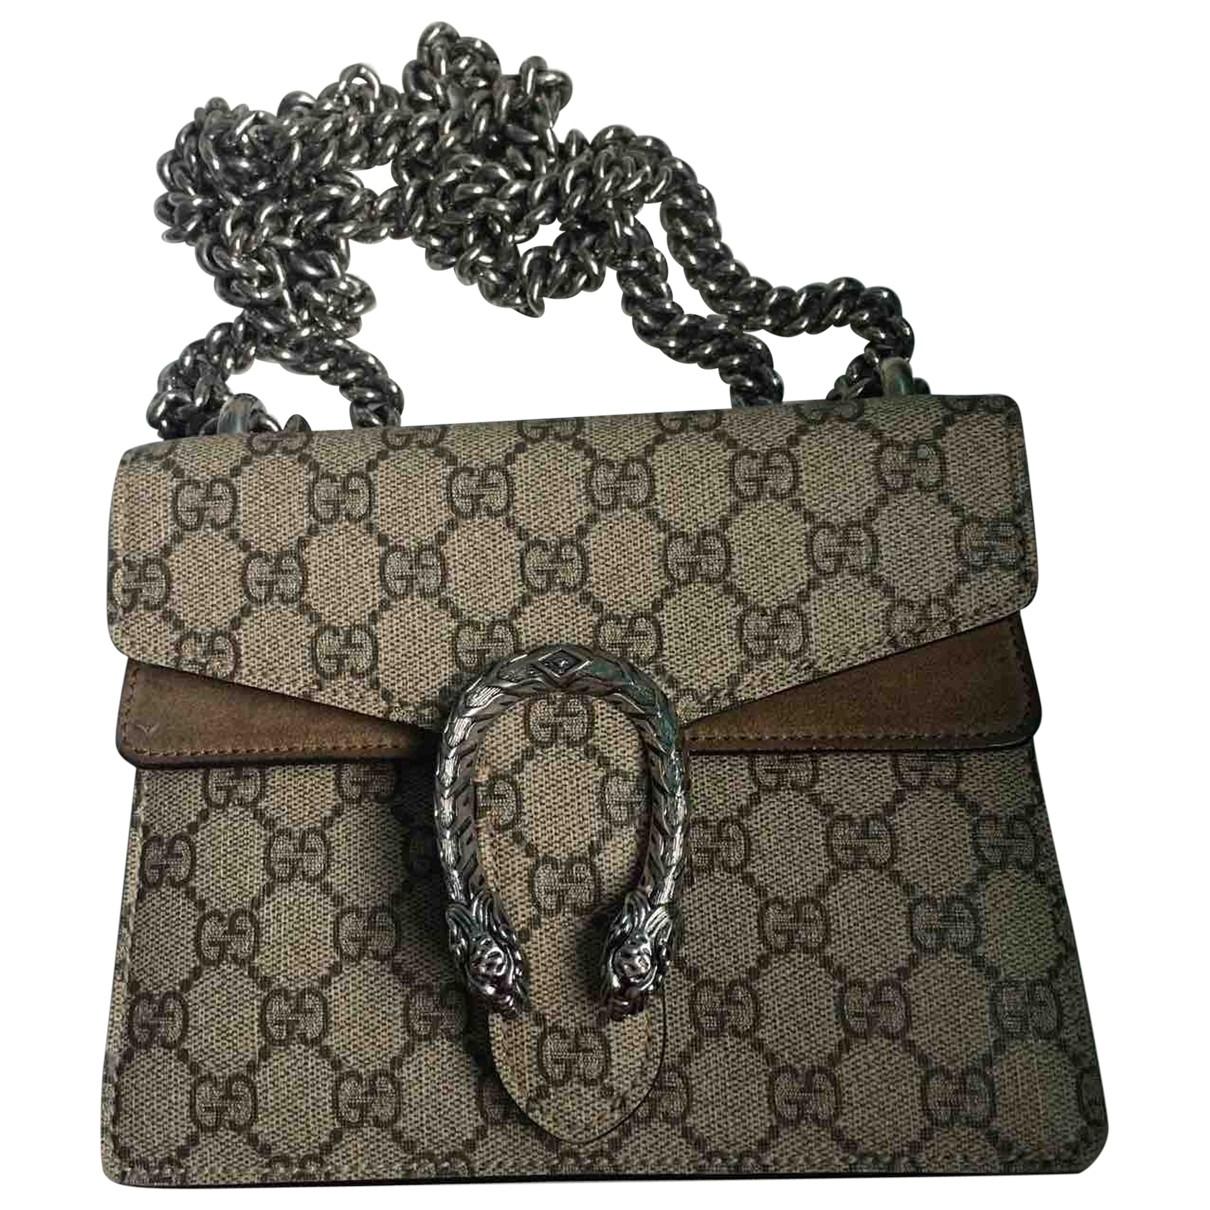 Gucci Dionysus Beige Leather handbag for Women \N